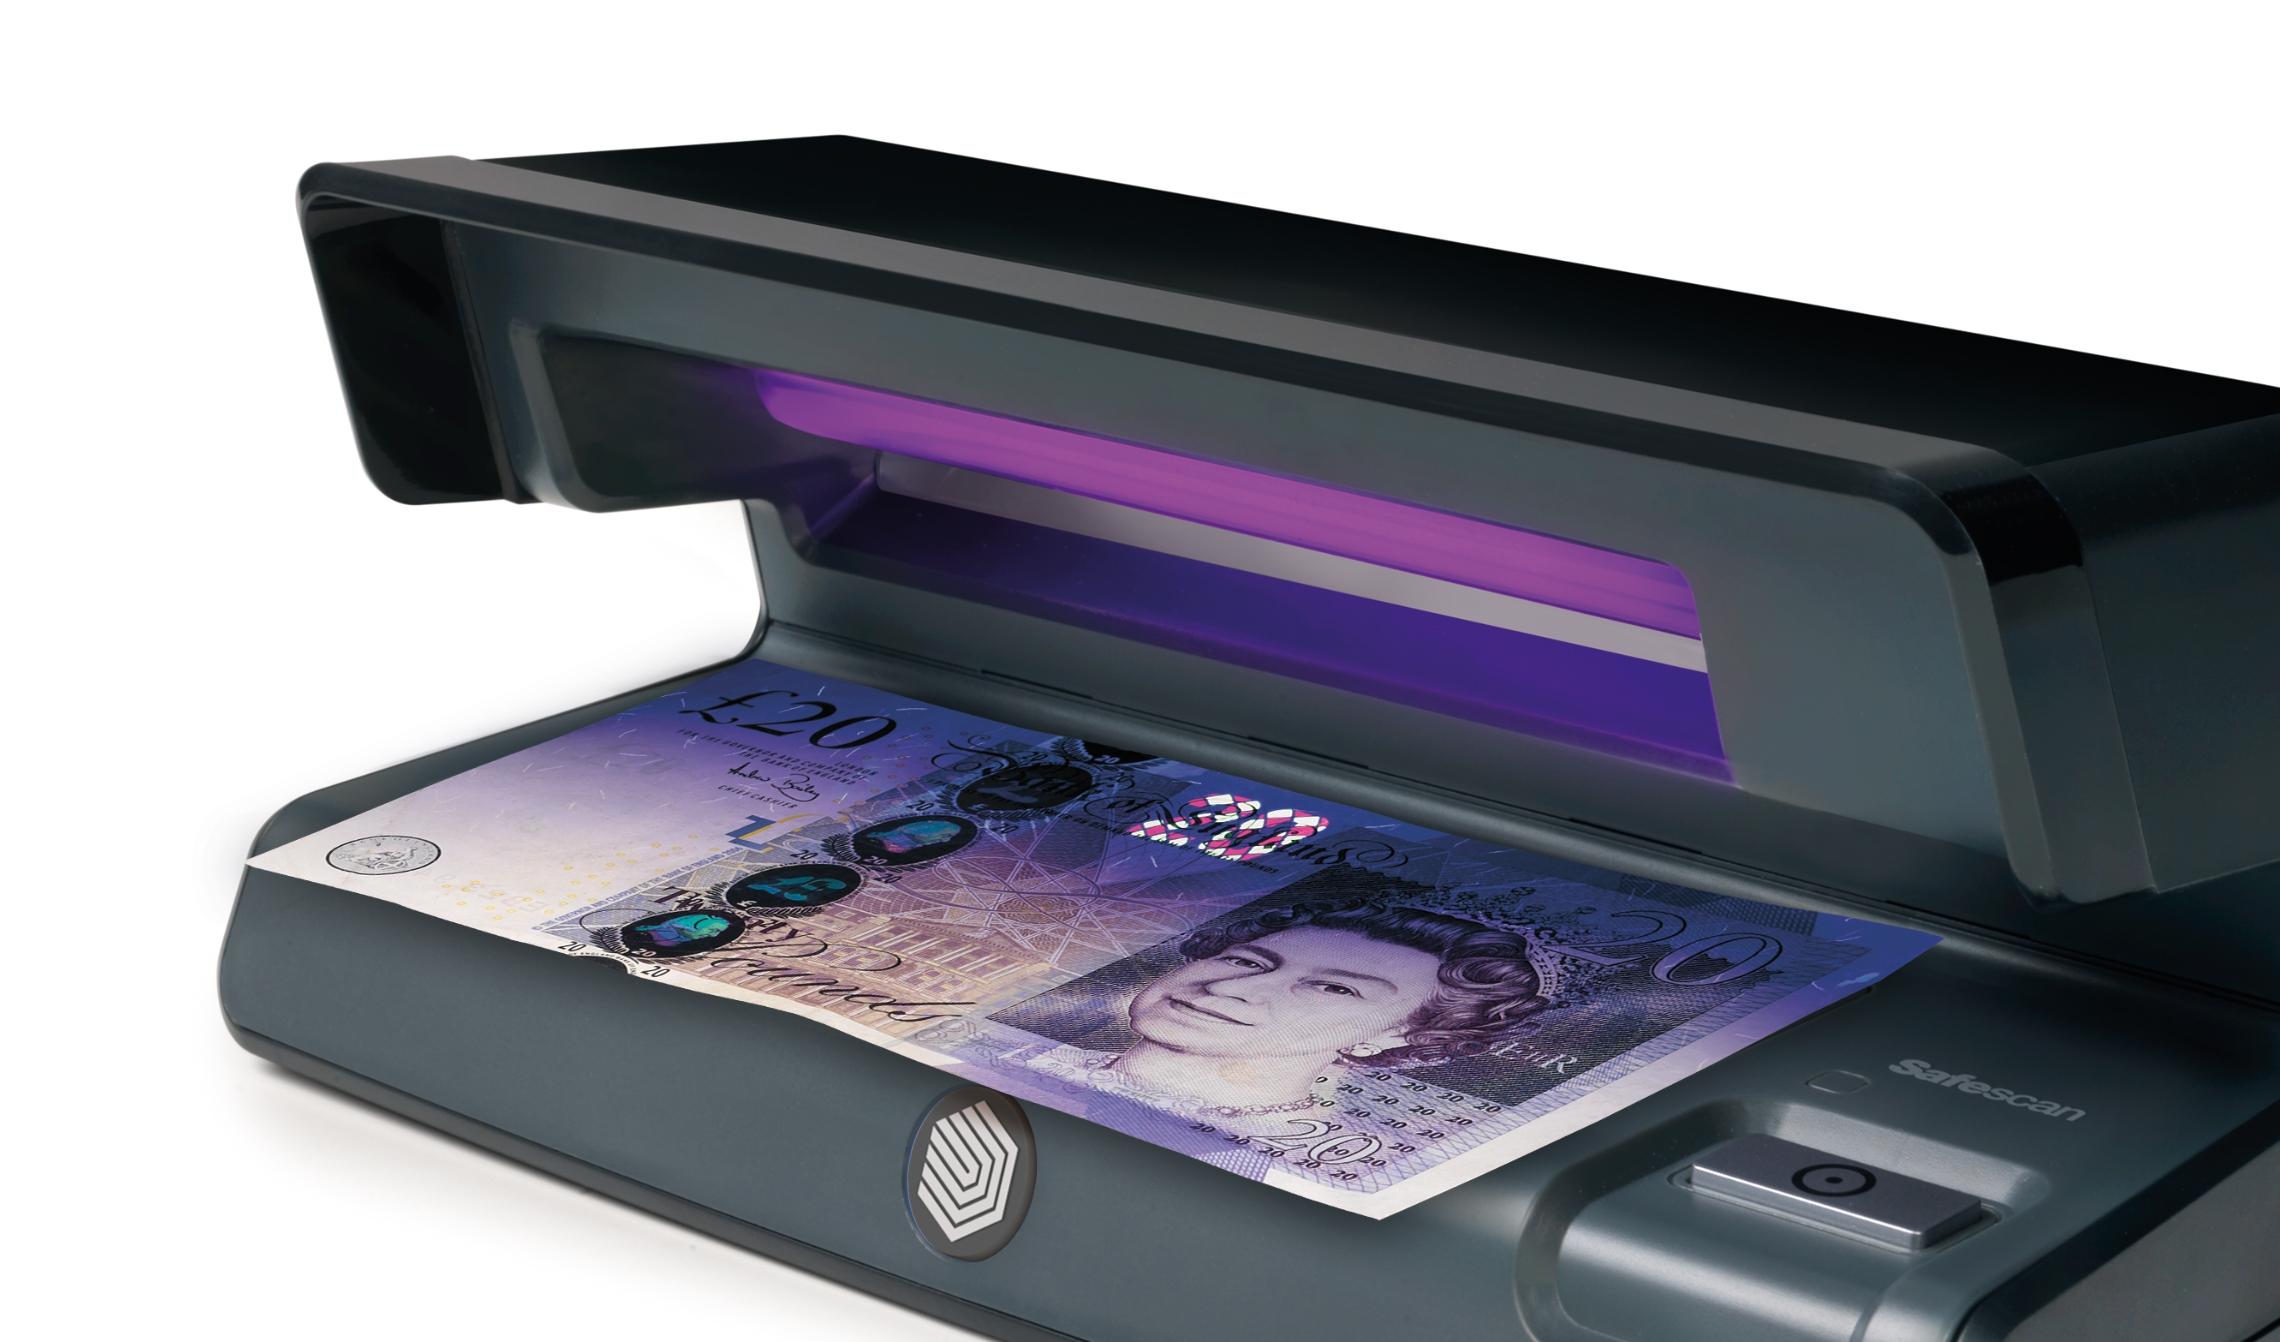 safescan-50-false-money-detector